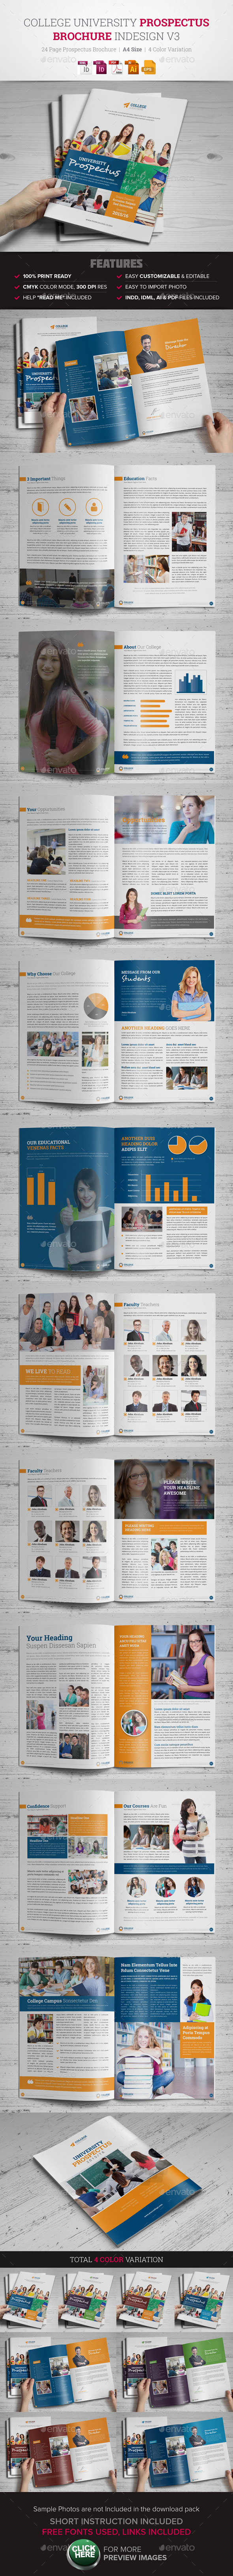 College University Prospectus Brochure v3 - Corporate Brochures